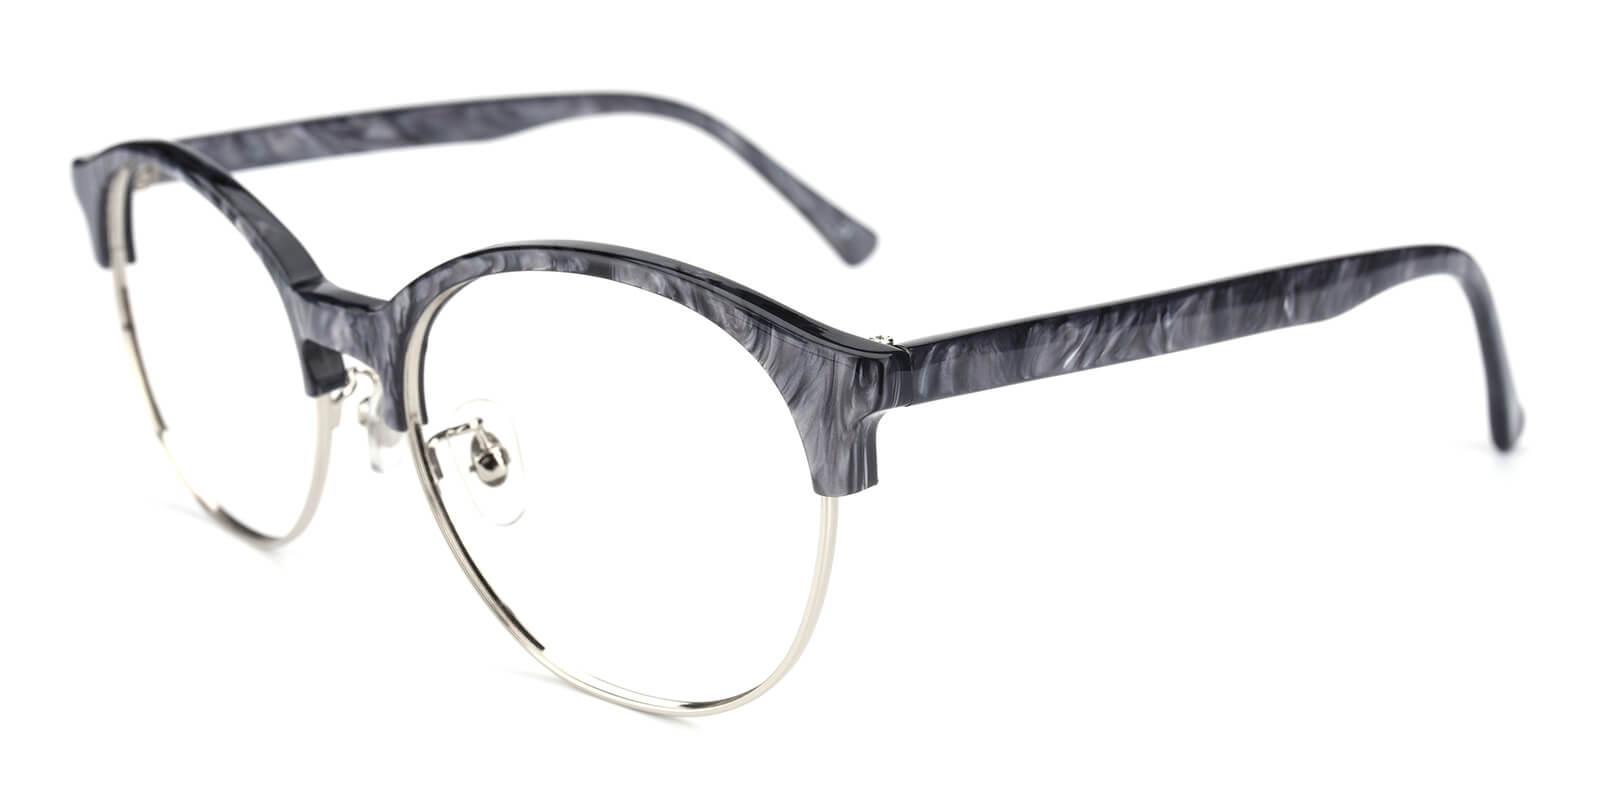 Mandisey-Gray-Browline-Combination-Eyeglasses-additional1